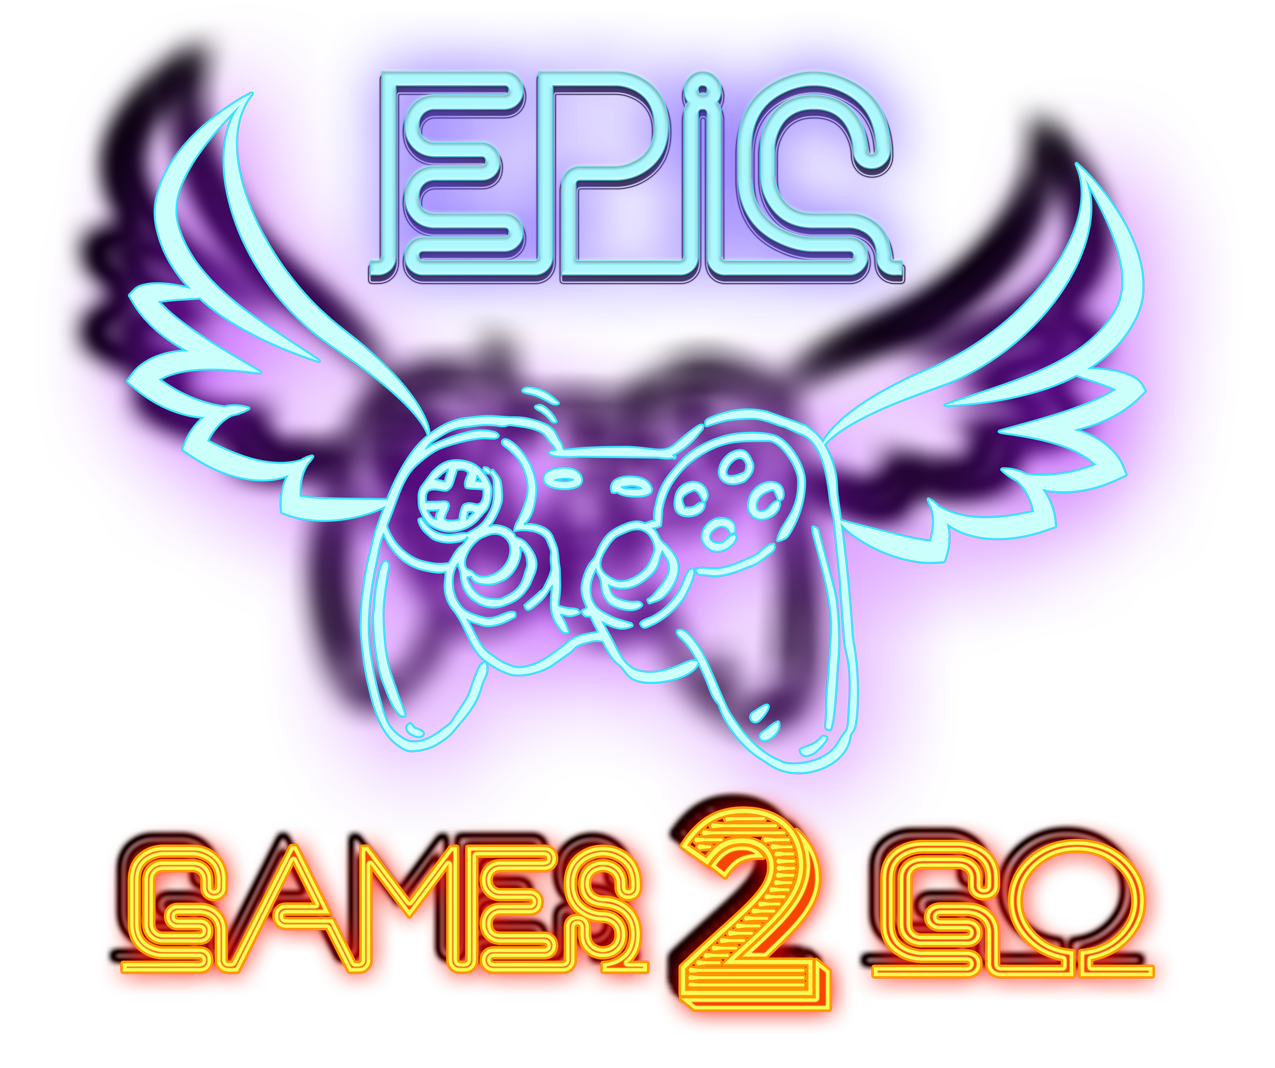 Epic Games2Go